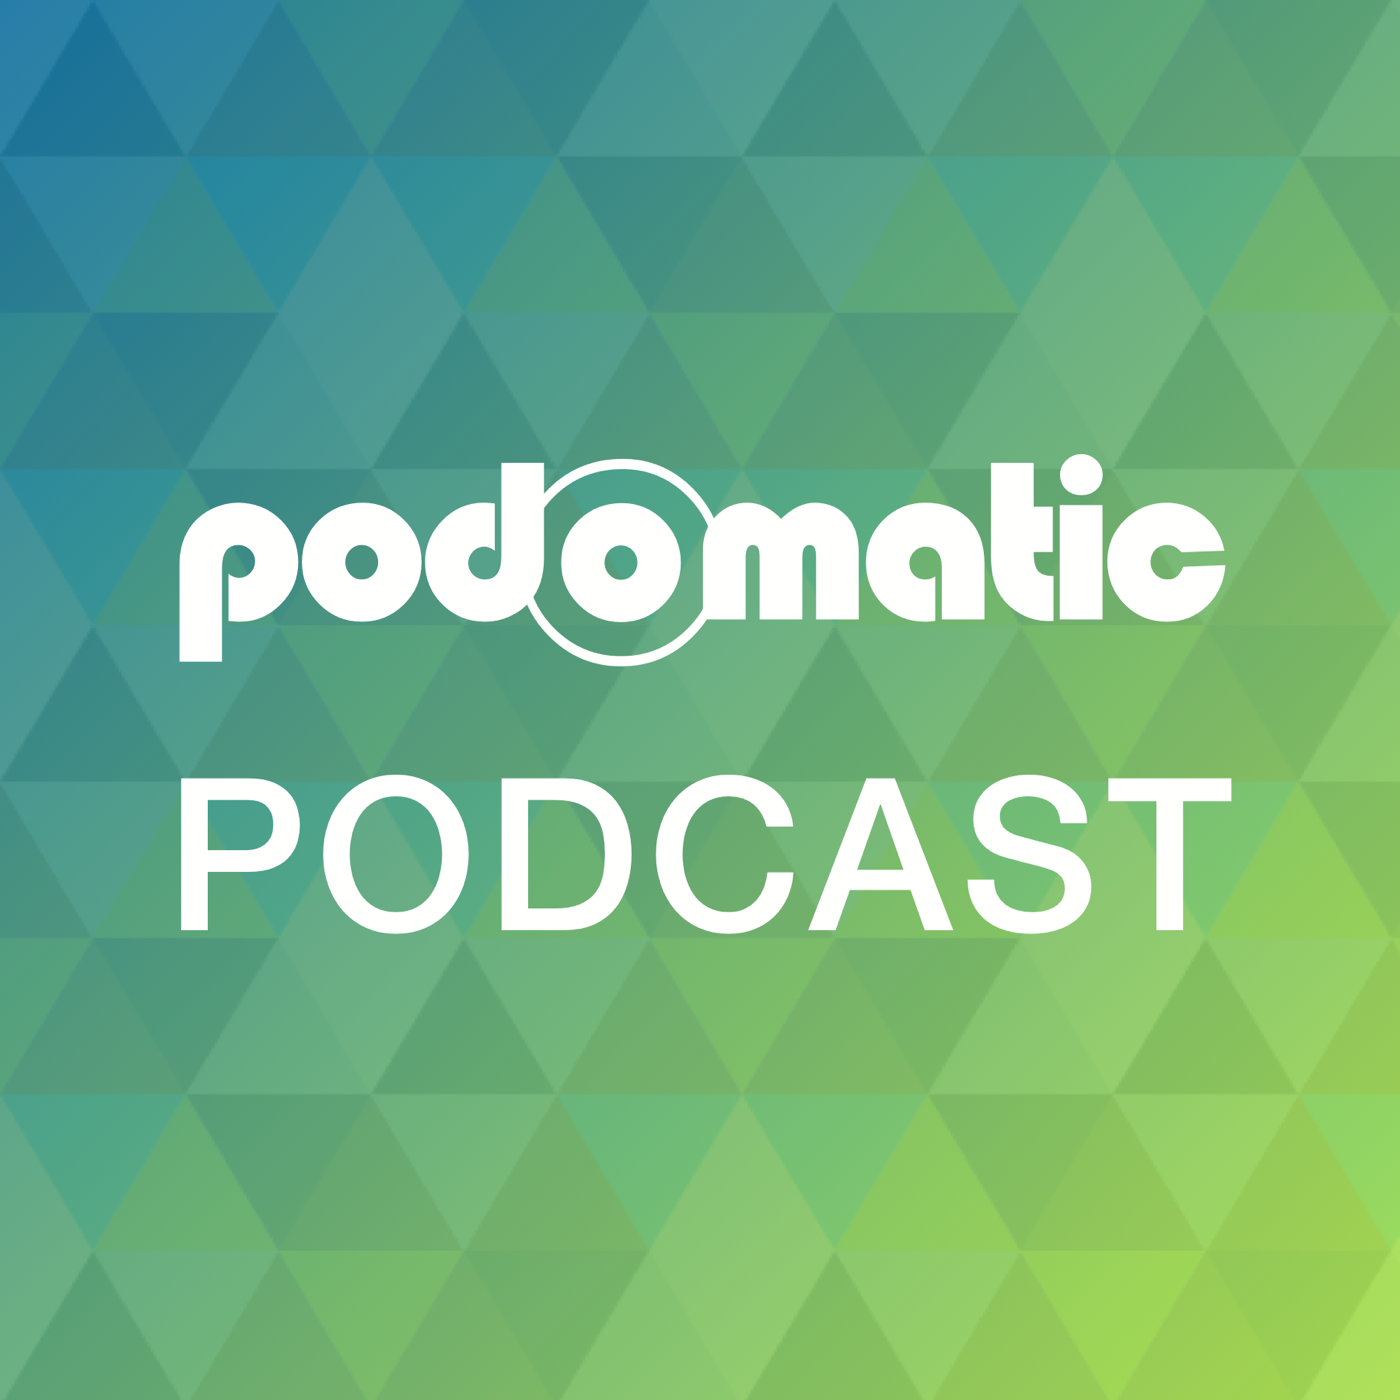 Website Magazine's Podcast